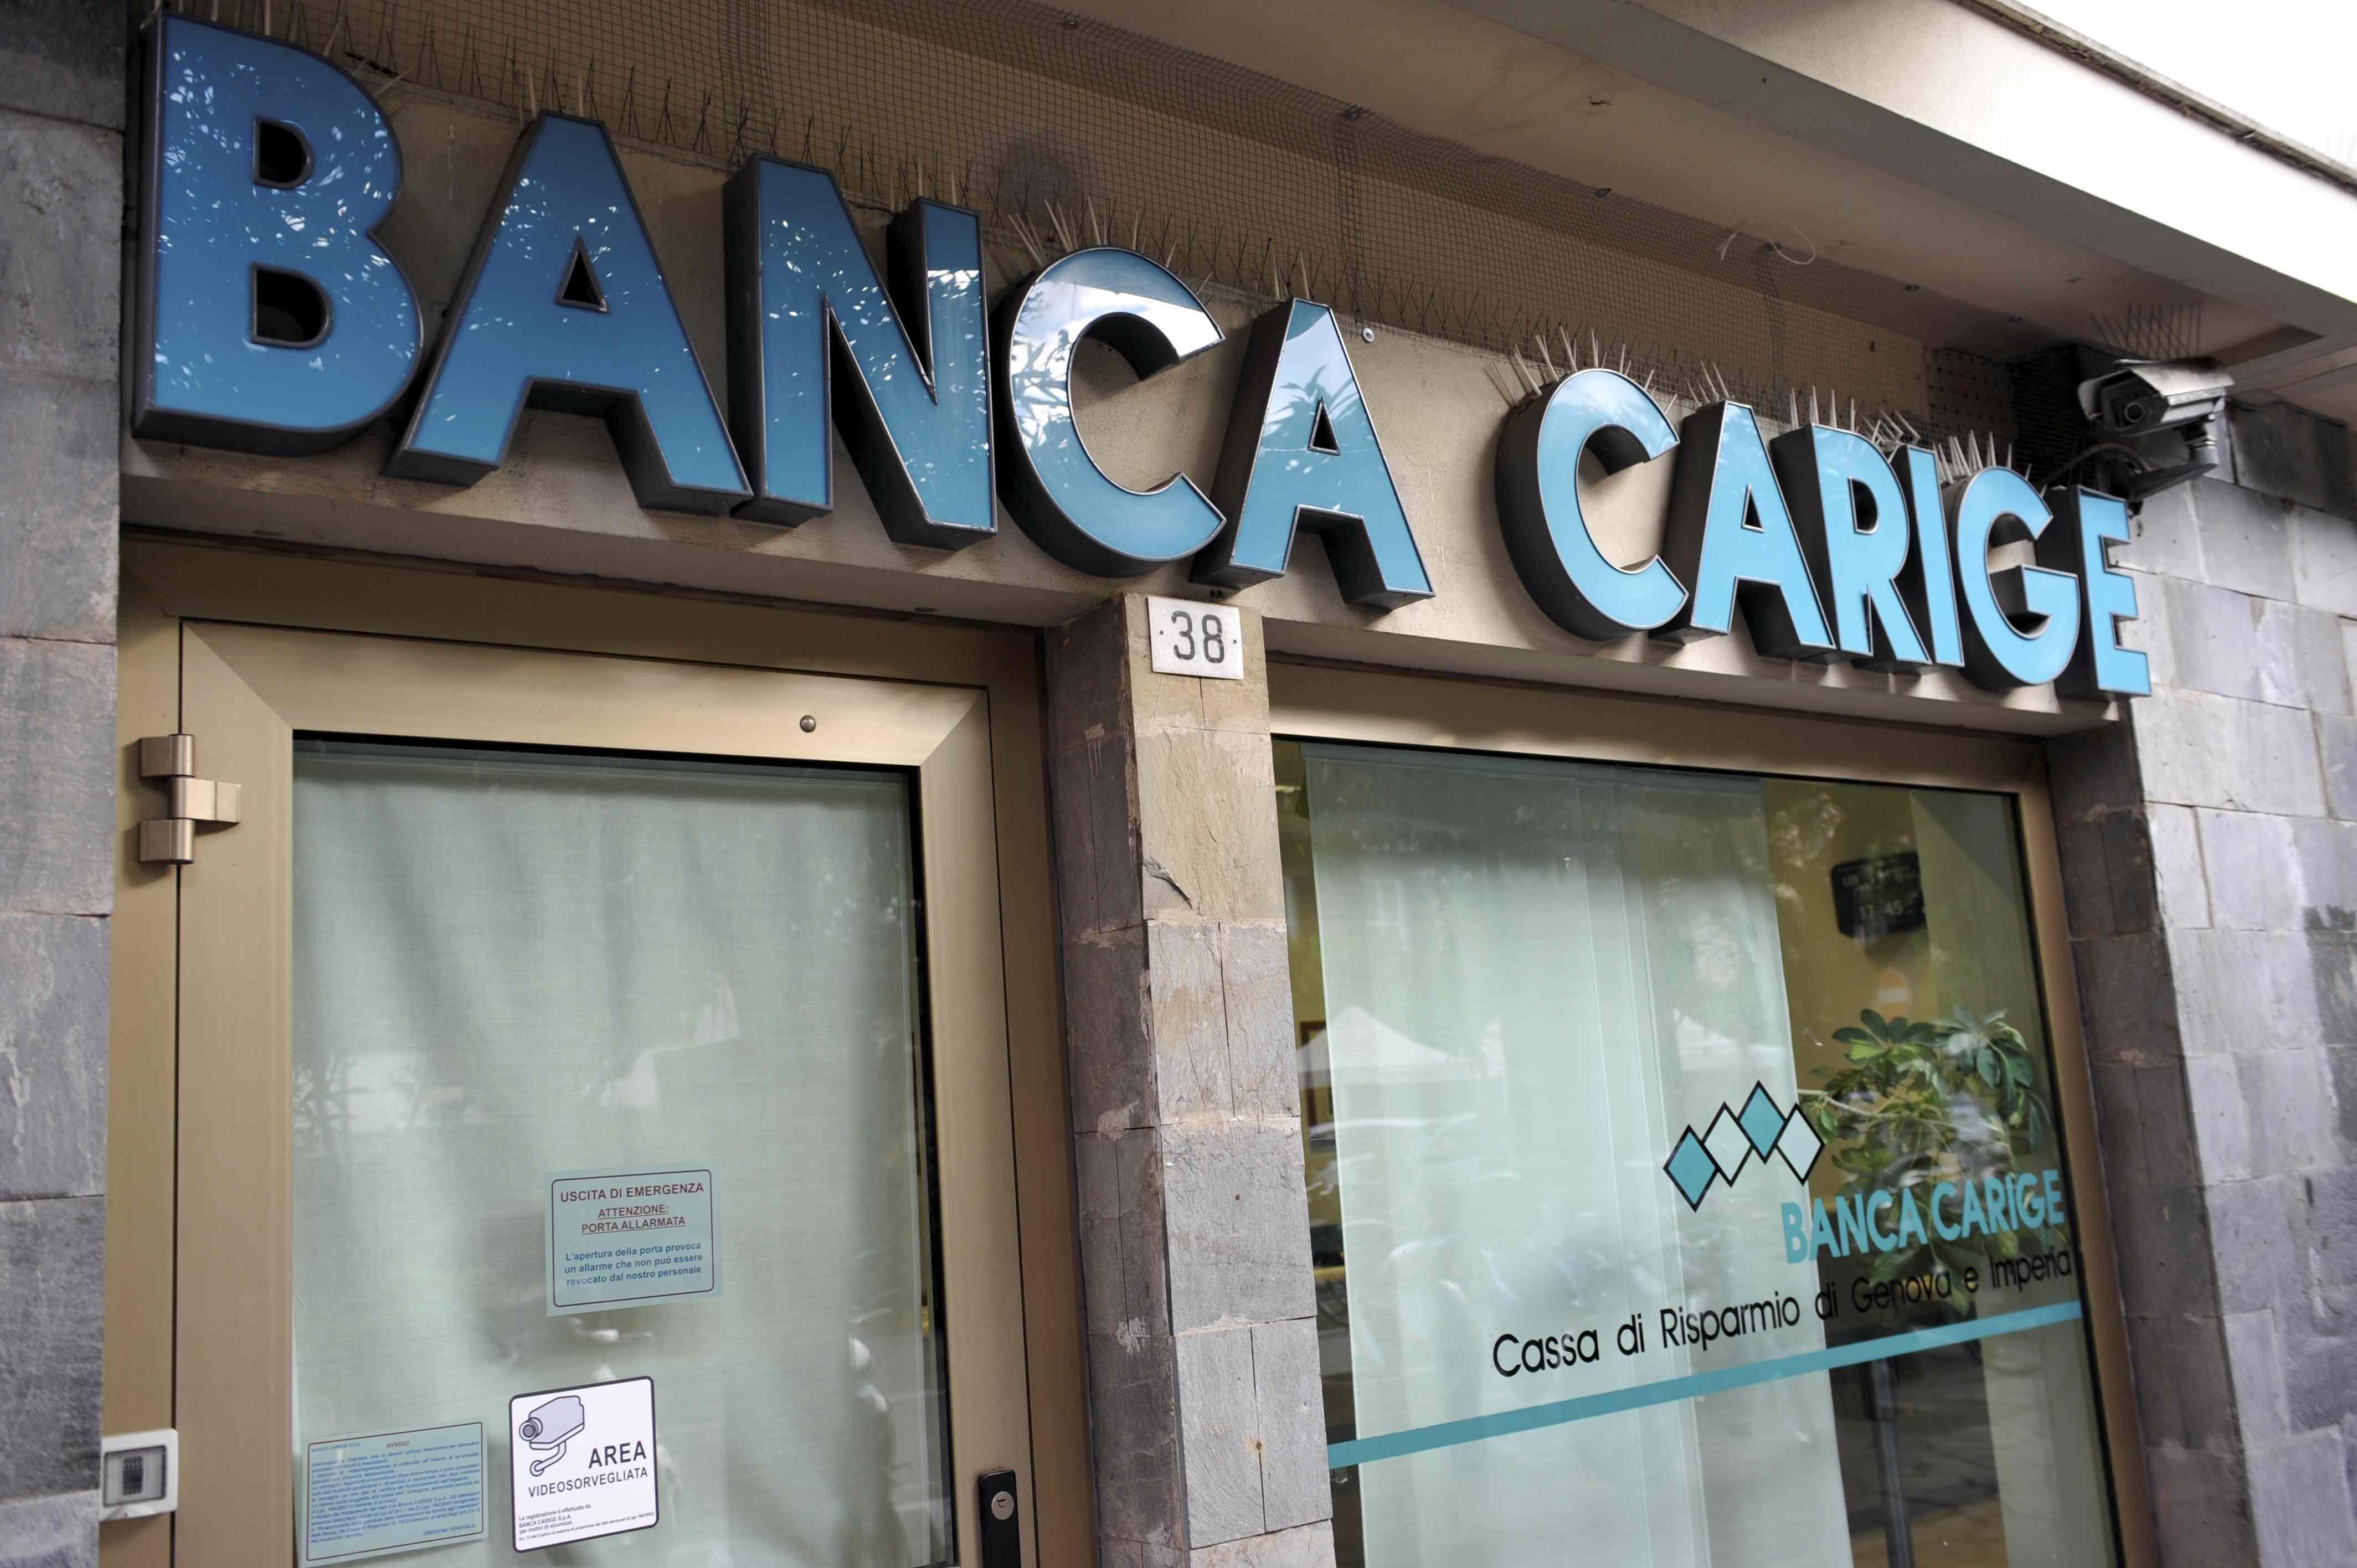 banca carige: notizie | wall street italia